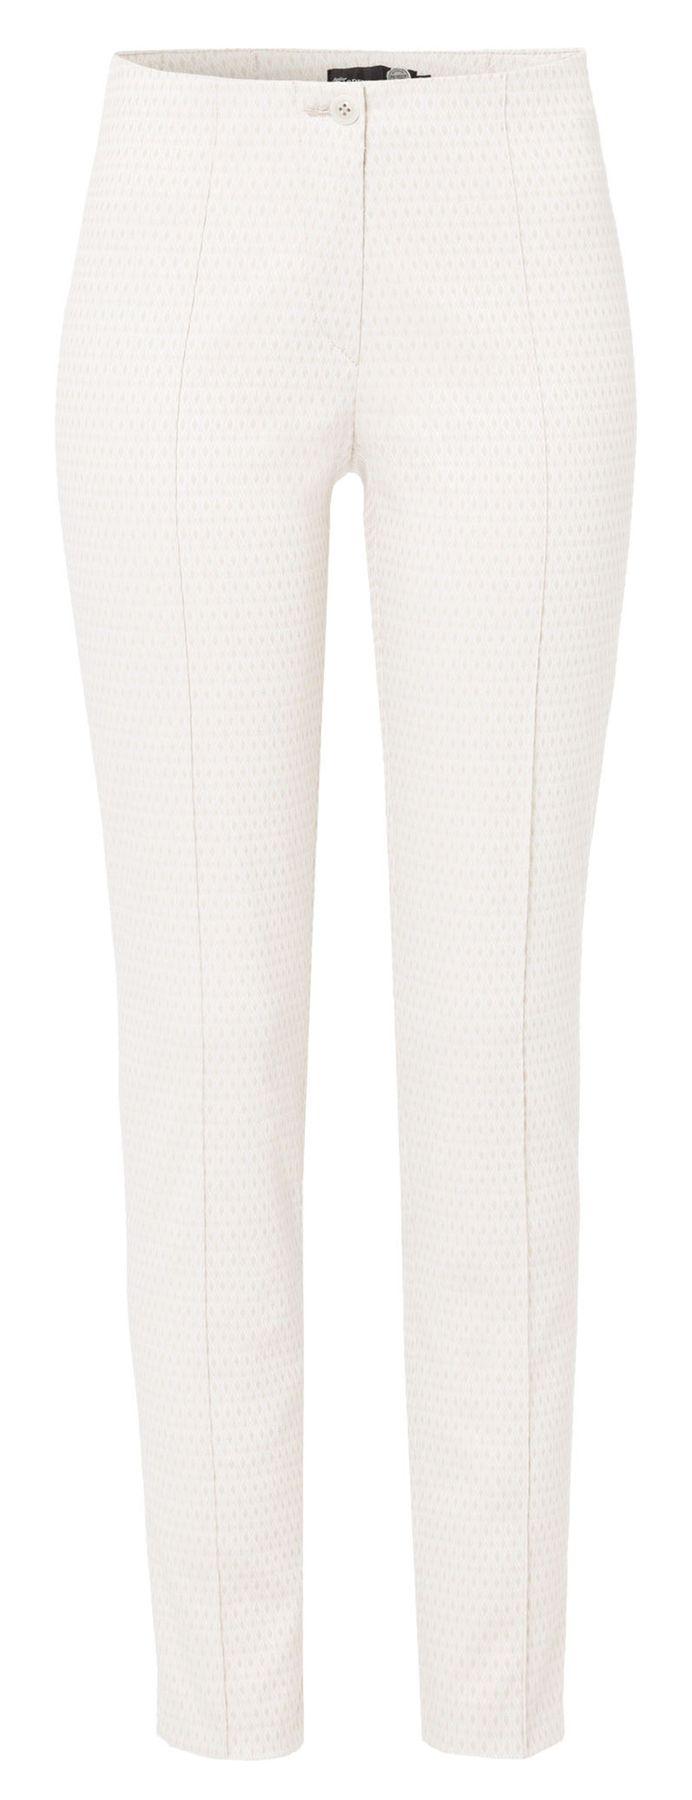 Atelier Gardeur - Super Slim Fit - Damen Stoffhose mit Jacquard Rautenmuster - Zene1 (641361) – Bild 1